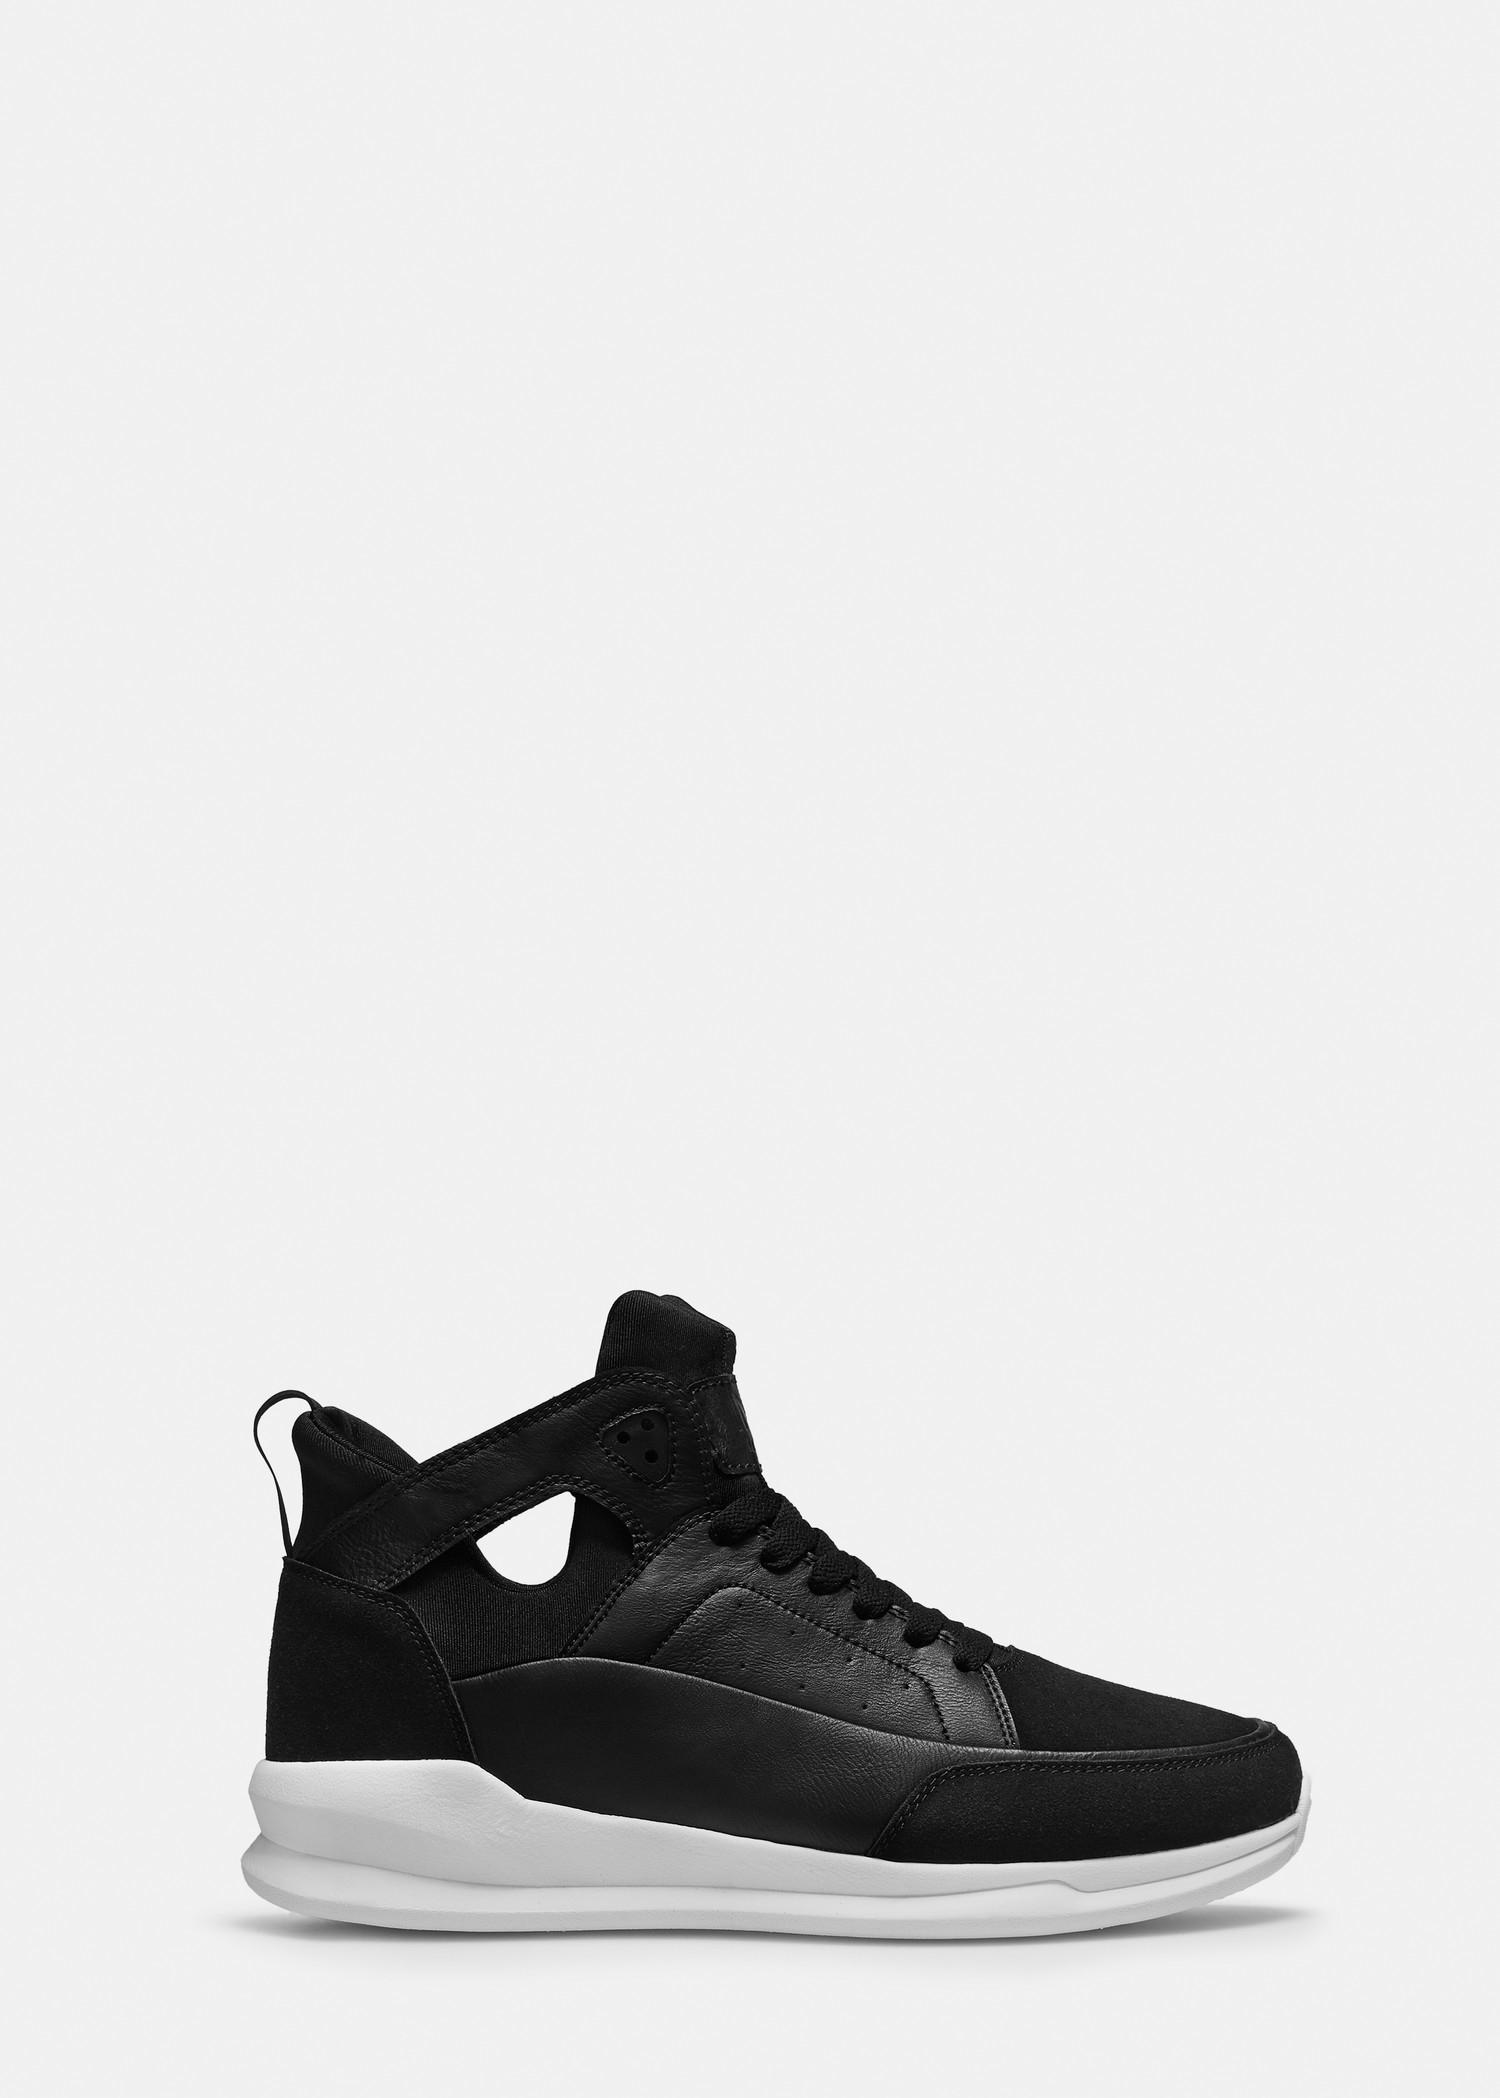 MANGO Contrast panel sneakers IvVXcMo3